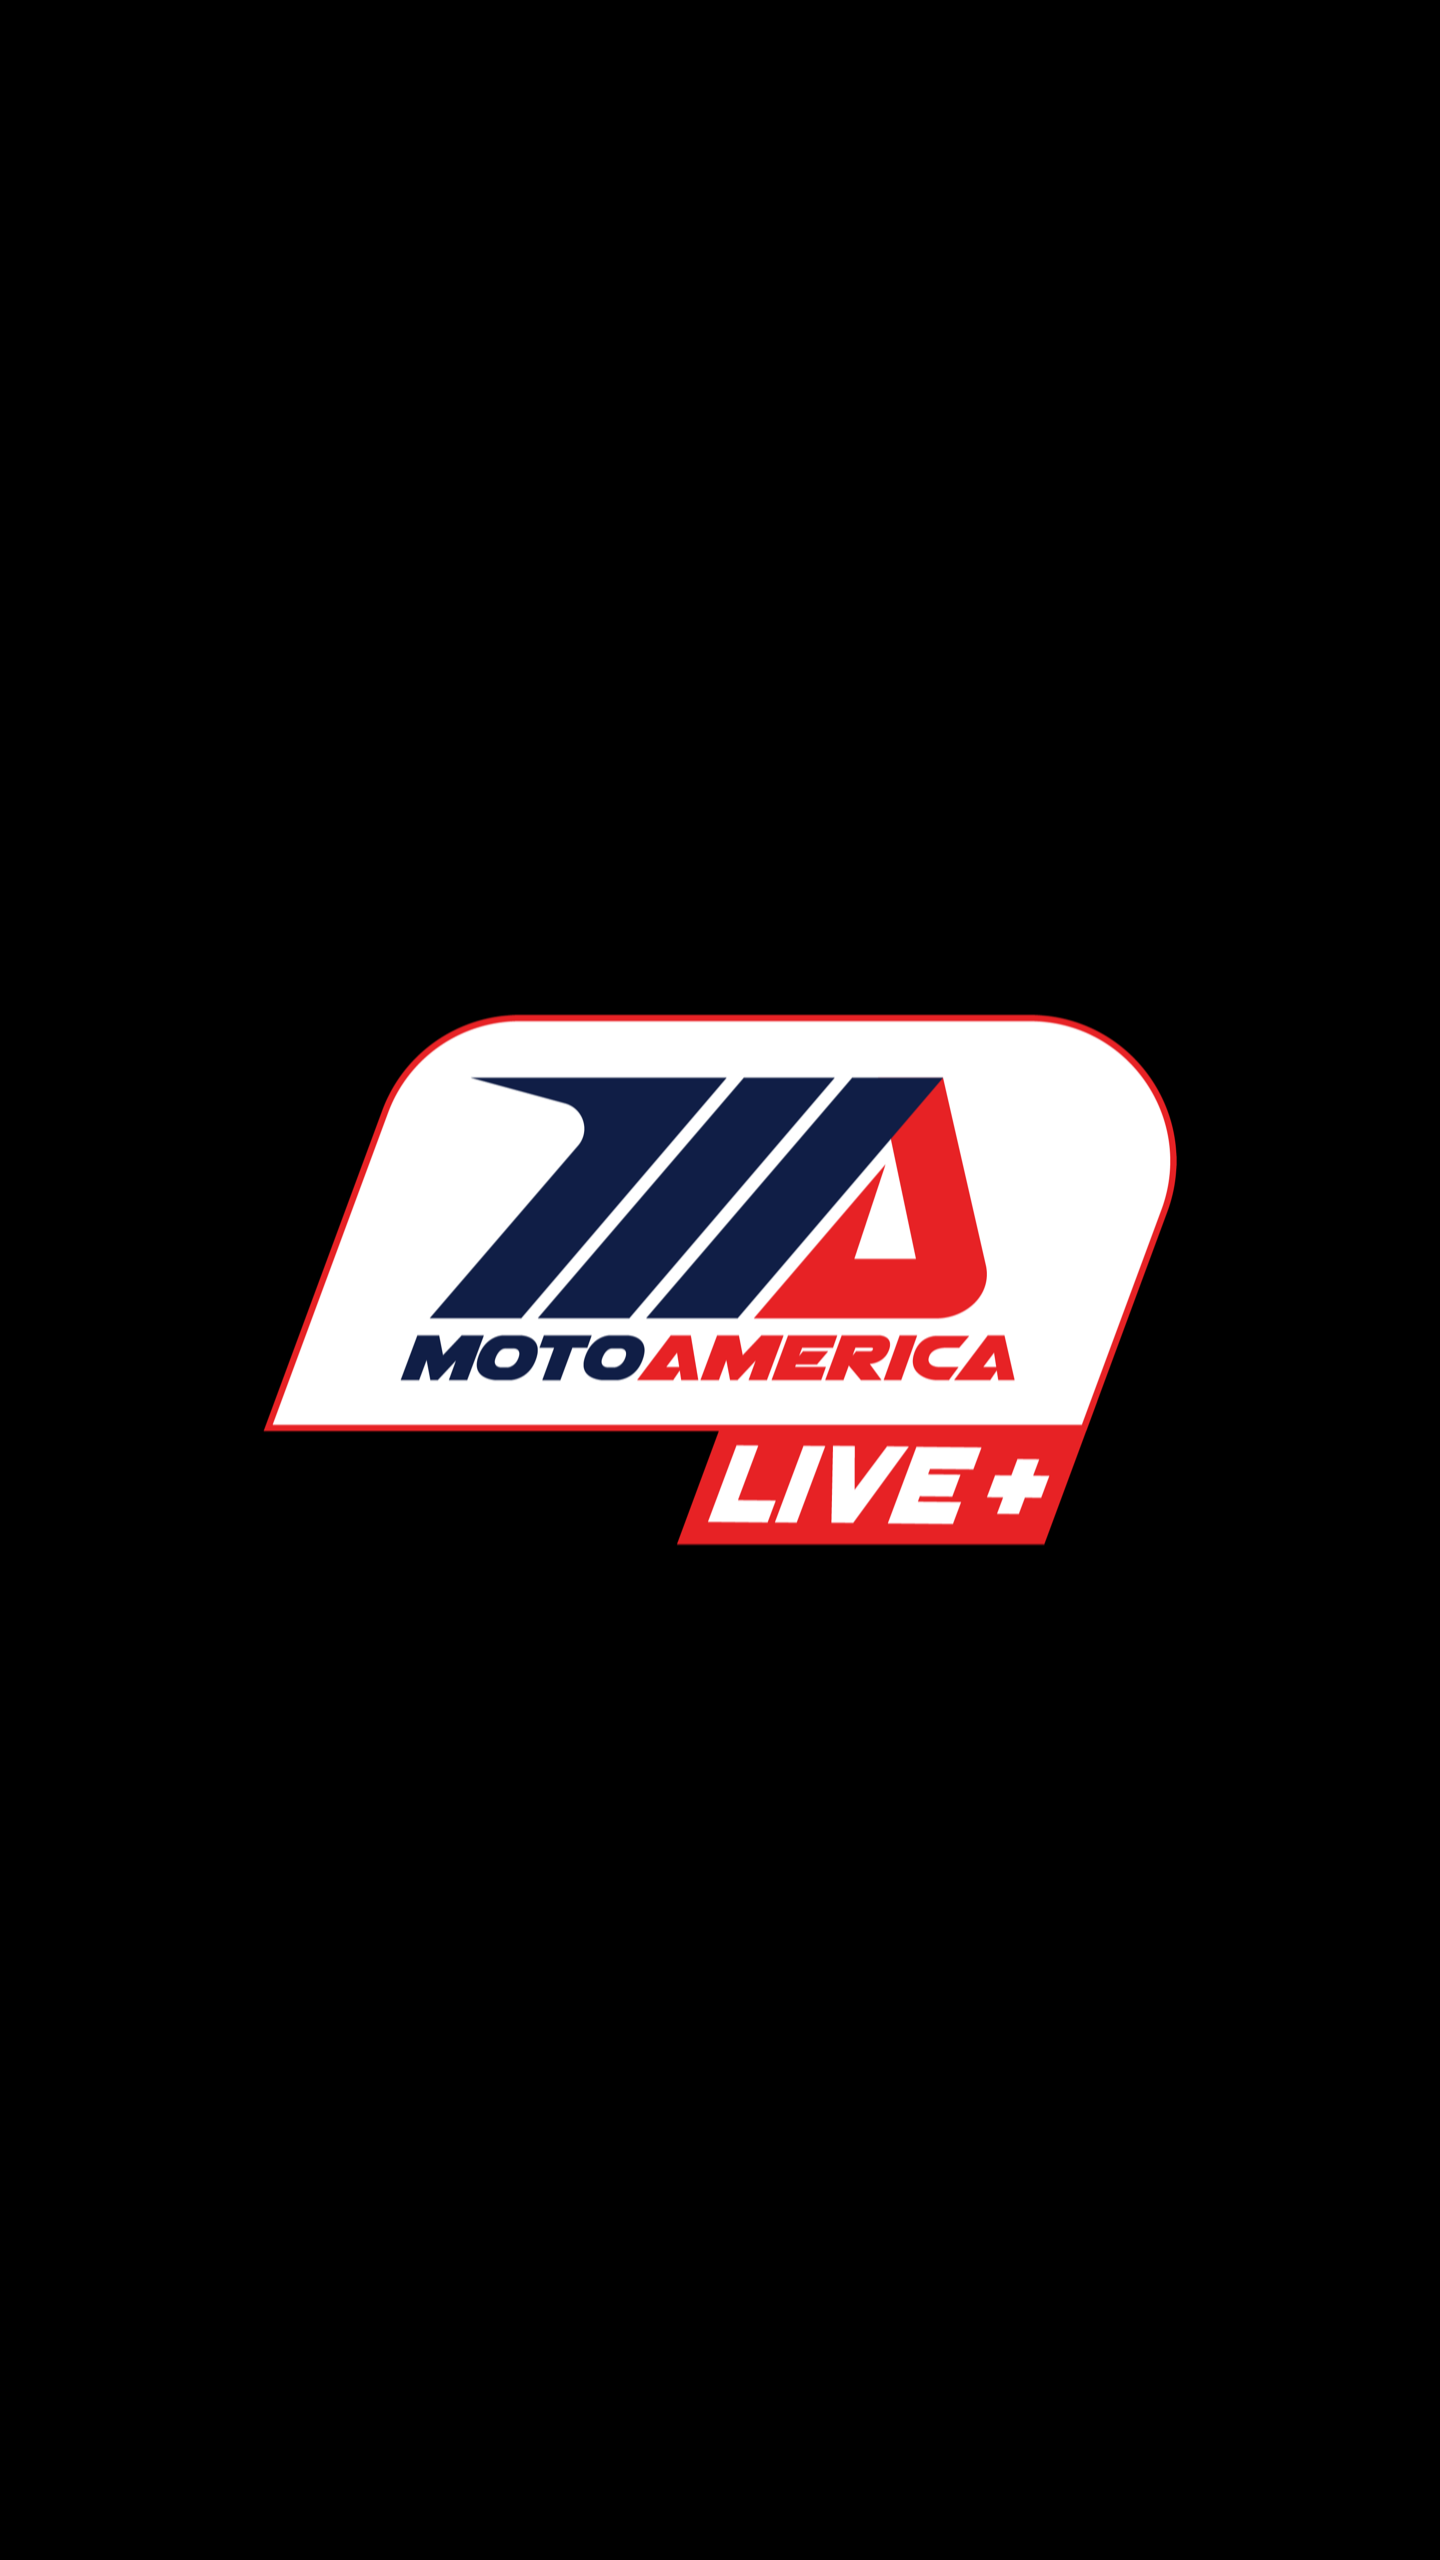 www.motoamericaliveplus.com